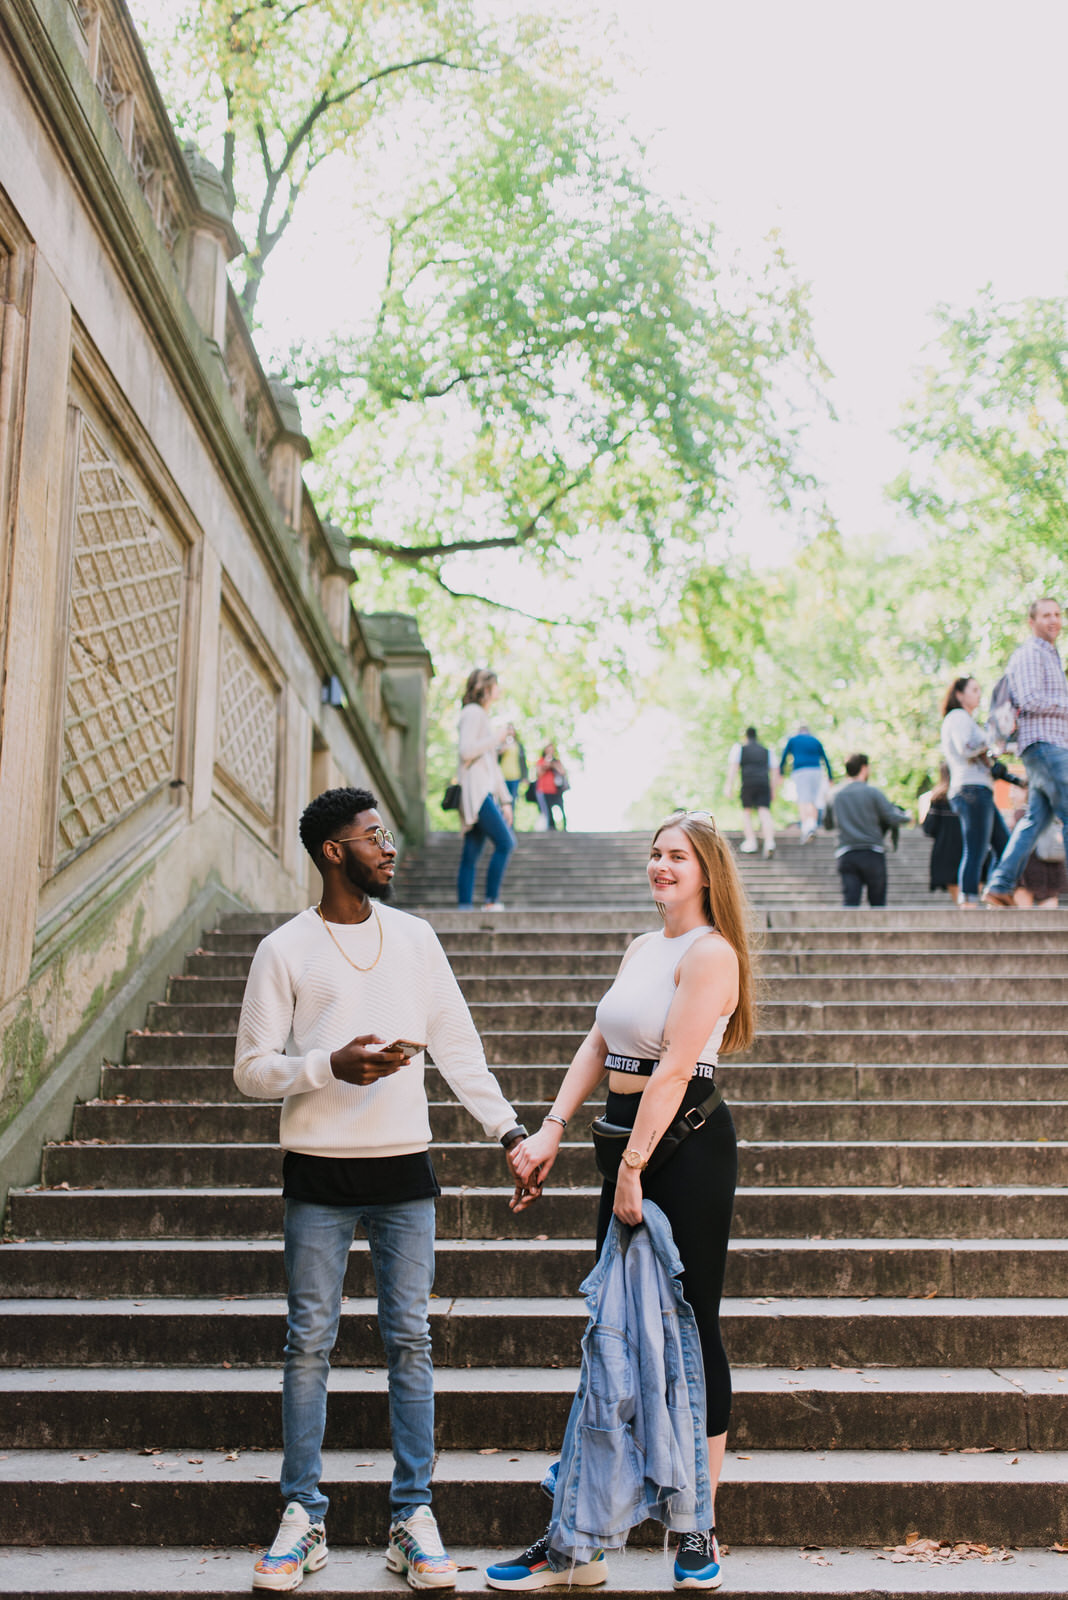 central park engagement shoot, NYC wedding photographer, NYC elopement, elopement photographer New York (9).jpg